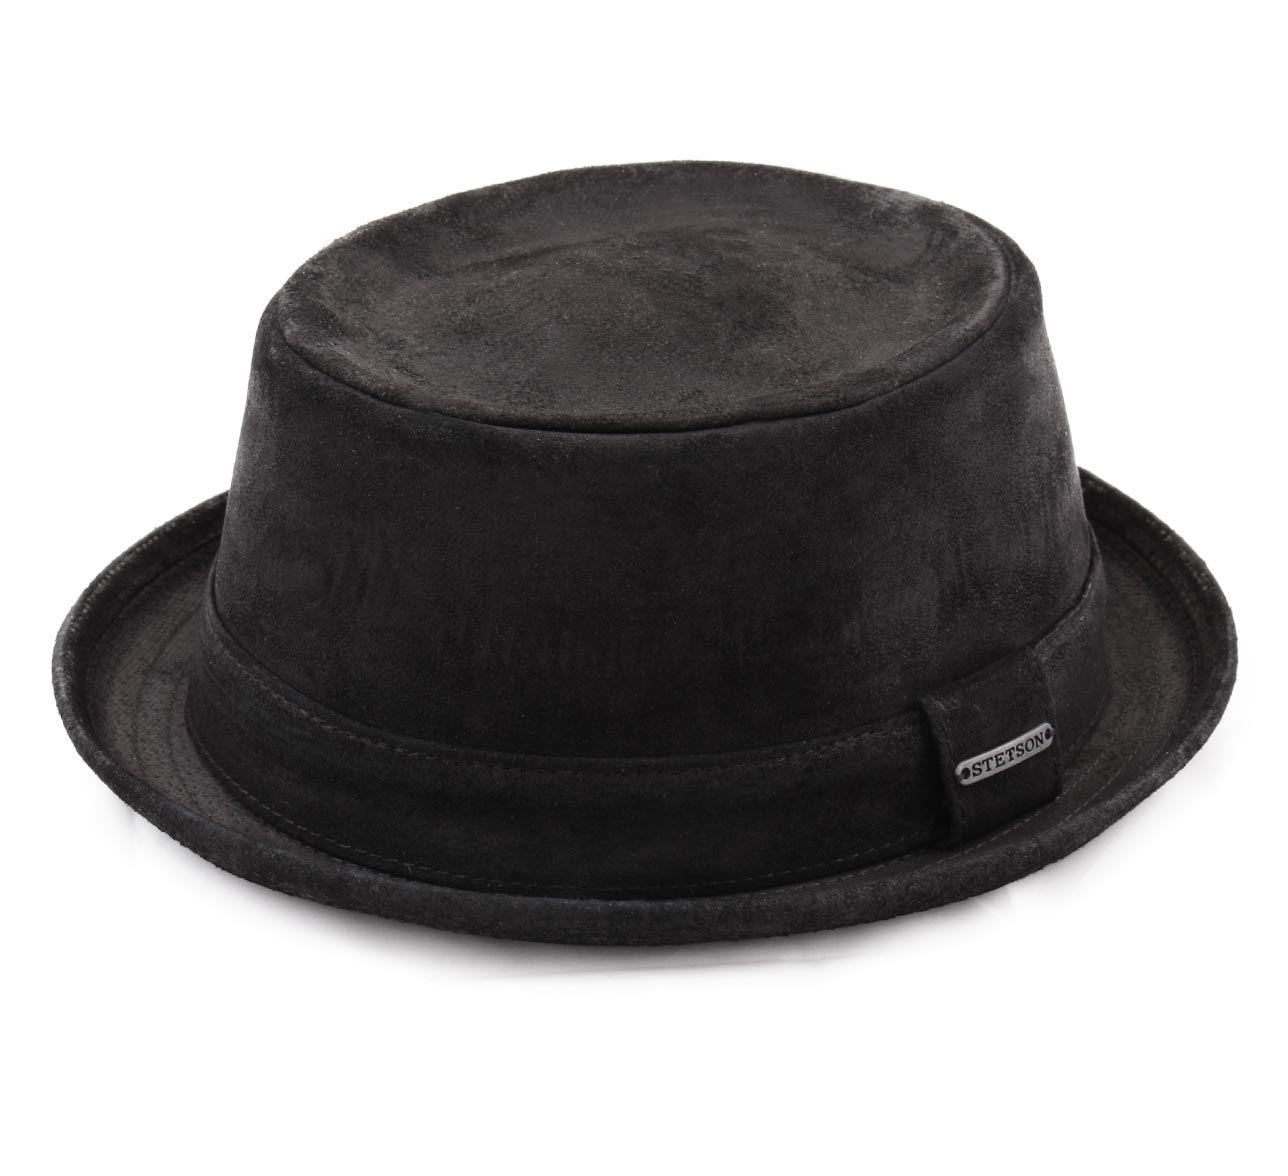 ea01a029698c04 Pork Pie Pig Skin - Hats Stetson